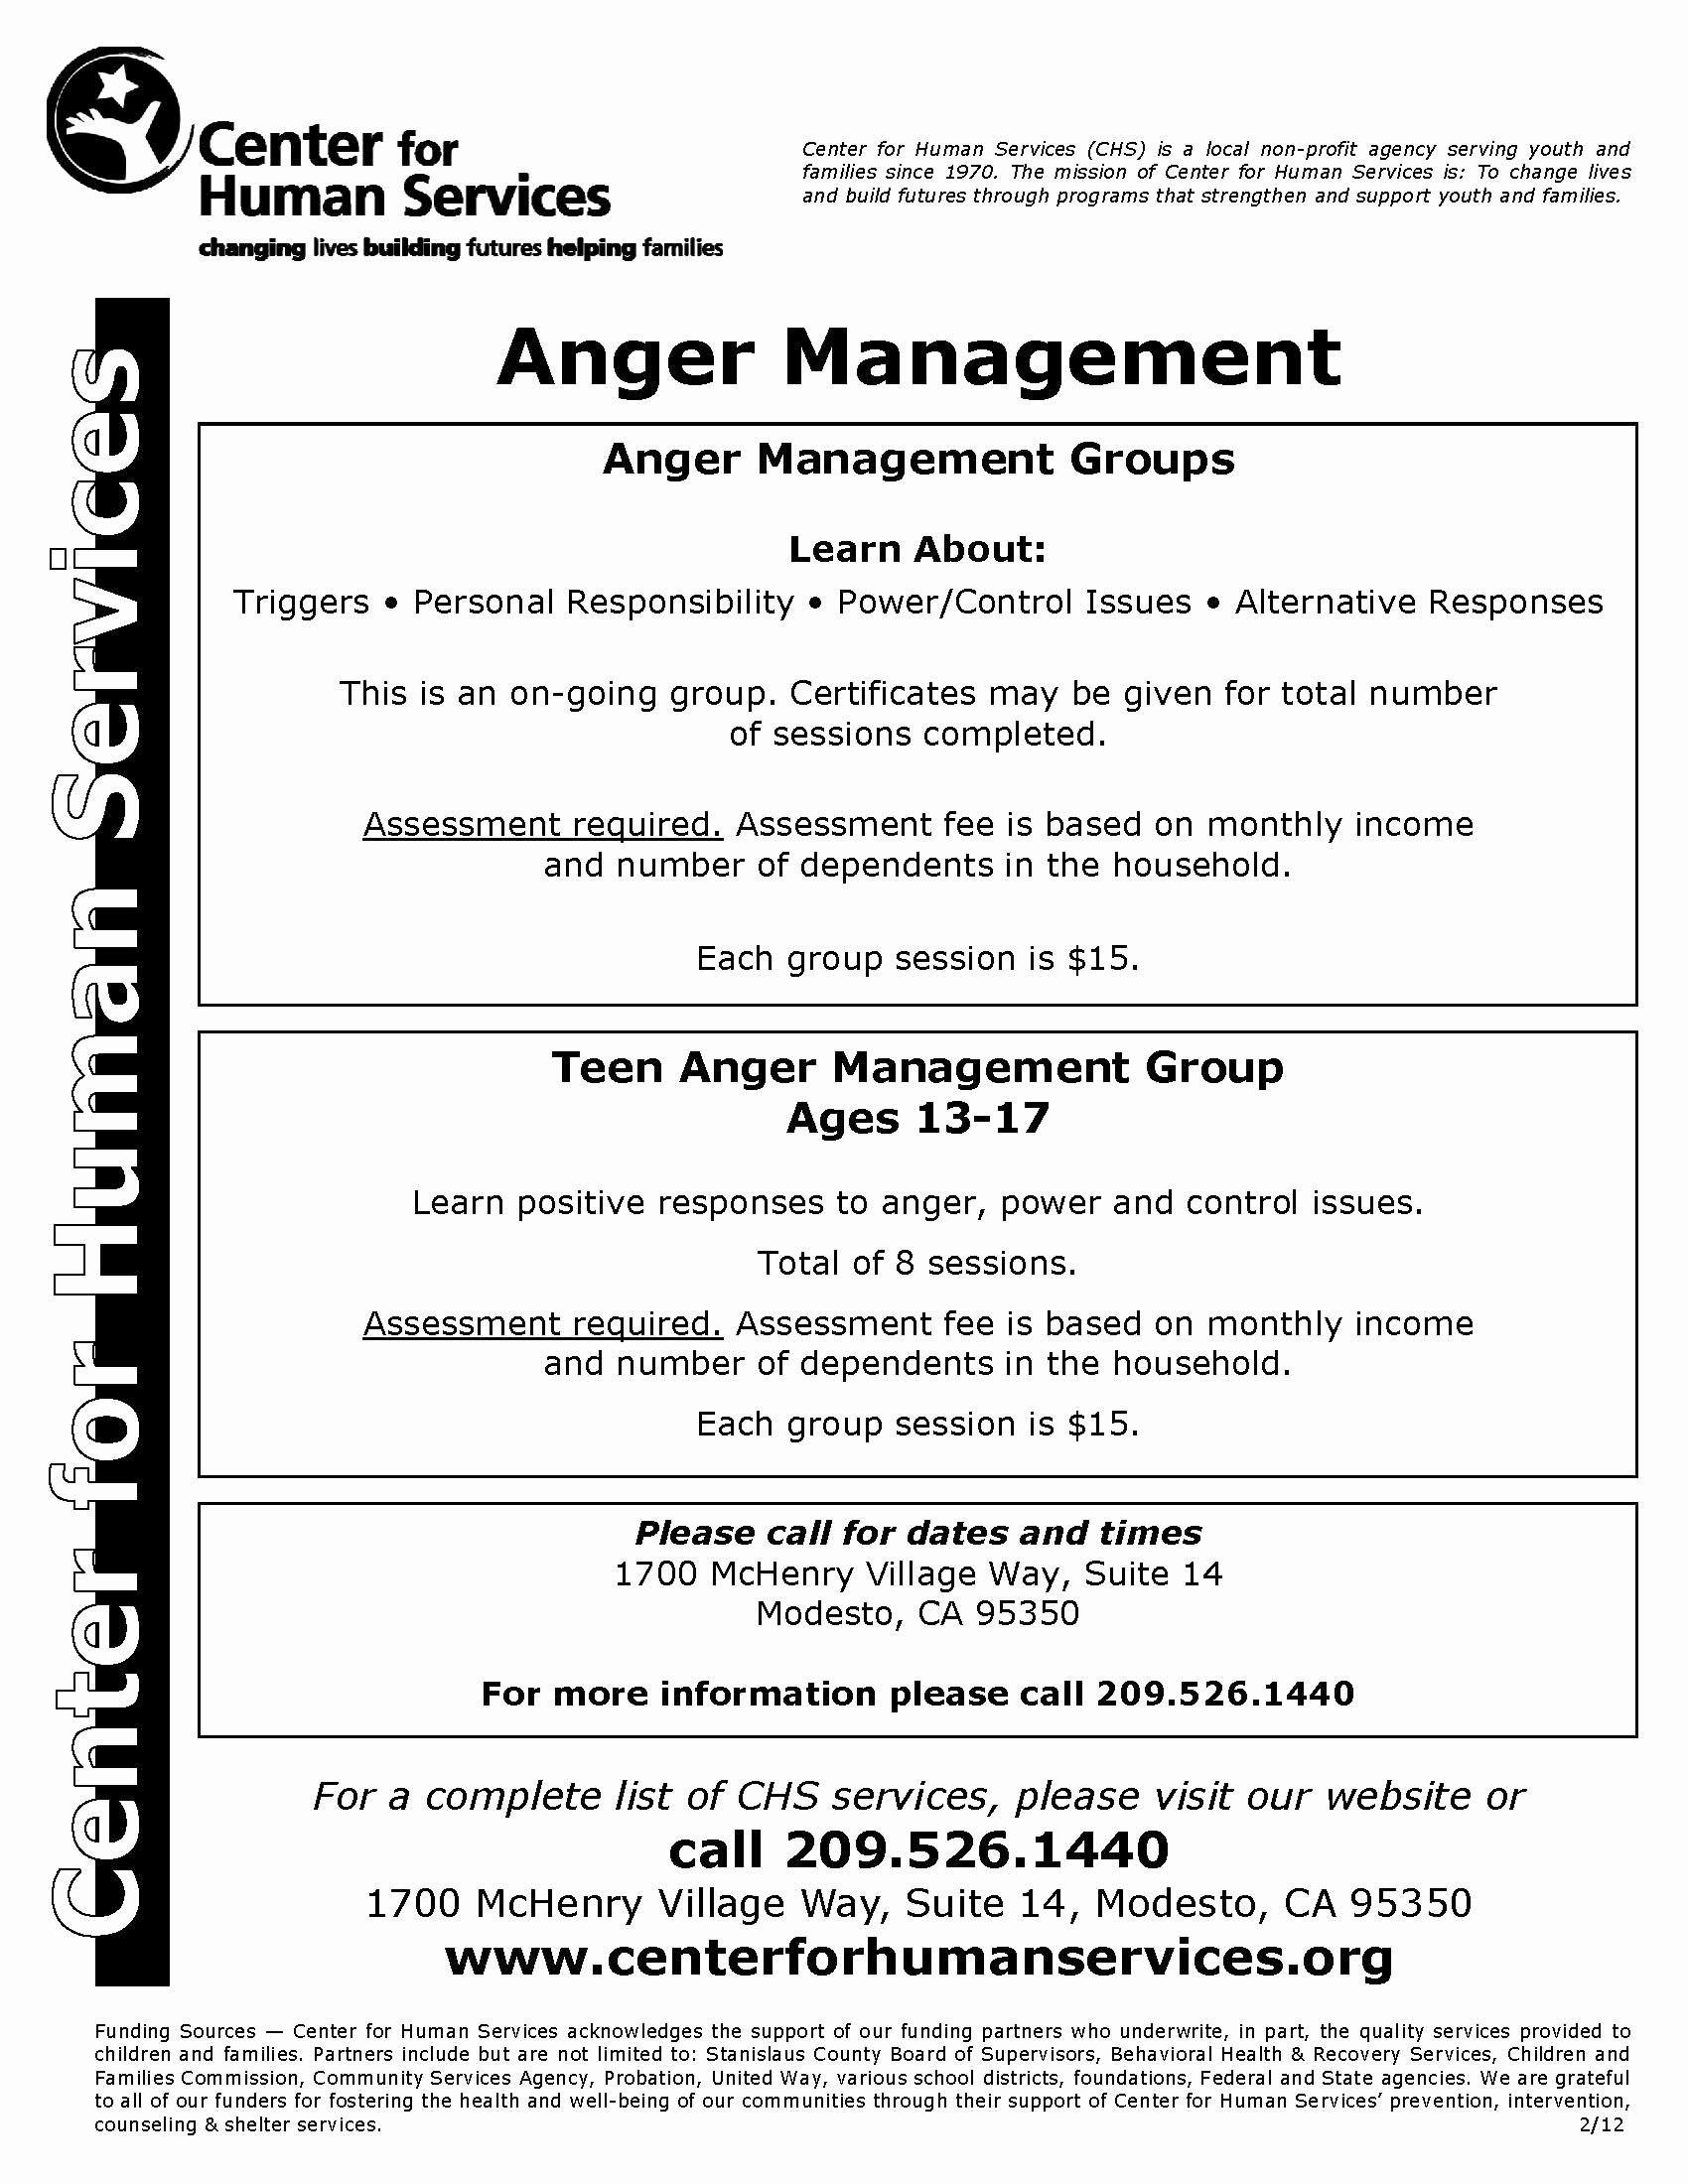 Anger management worksheet for teens new k 12 student